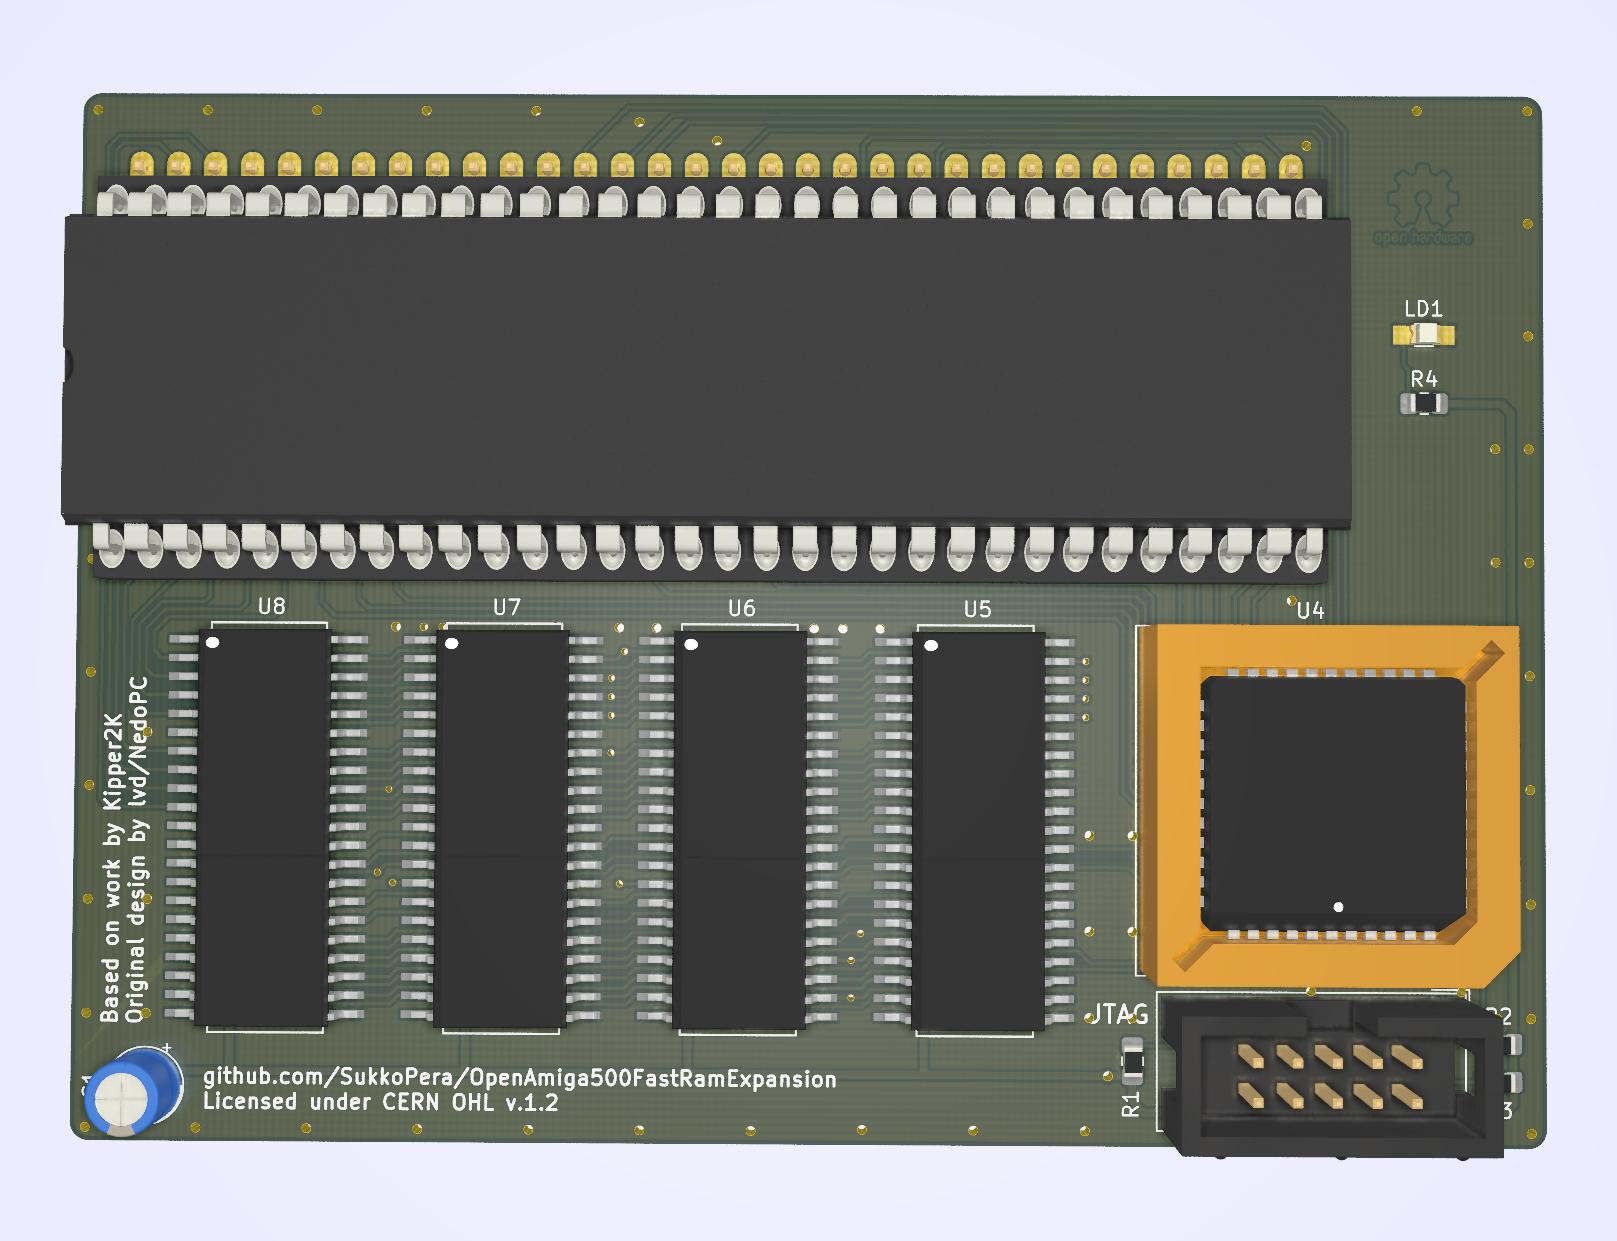 github sukkopera openamiga500fastramexpansion 4 8 mb fast  looking at an old amiga 500 pcb